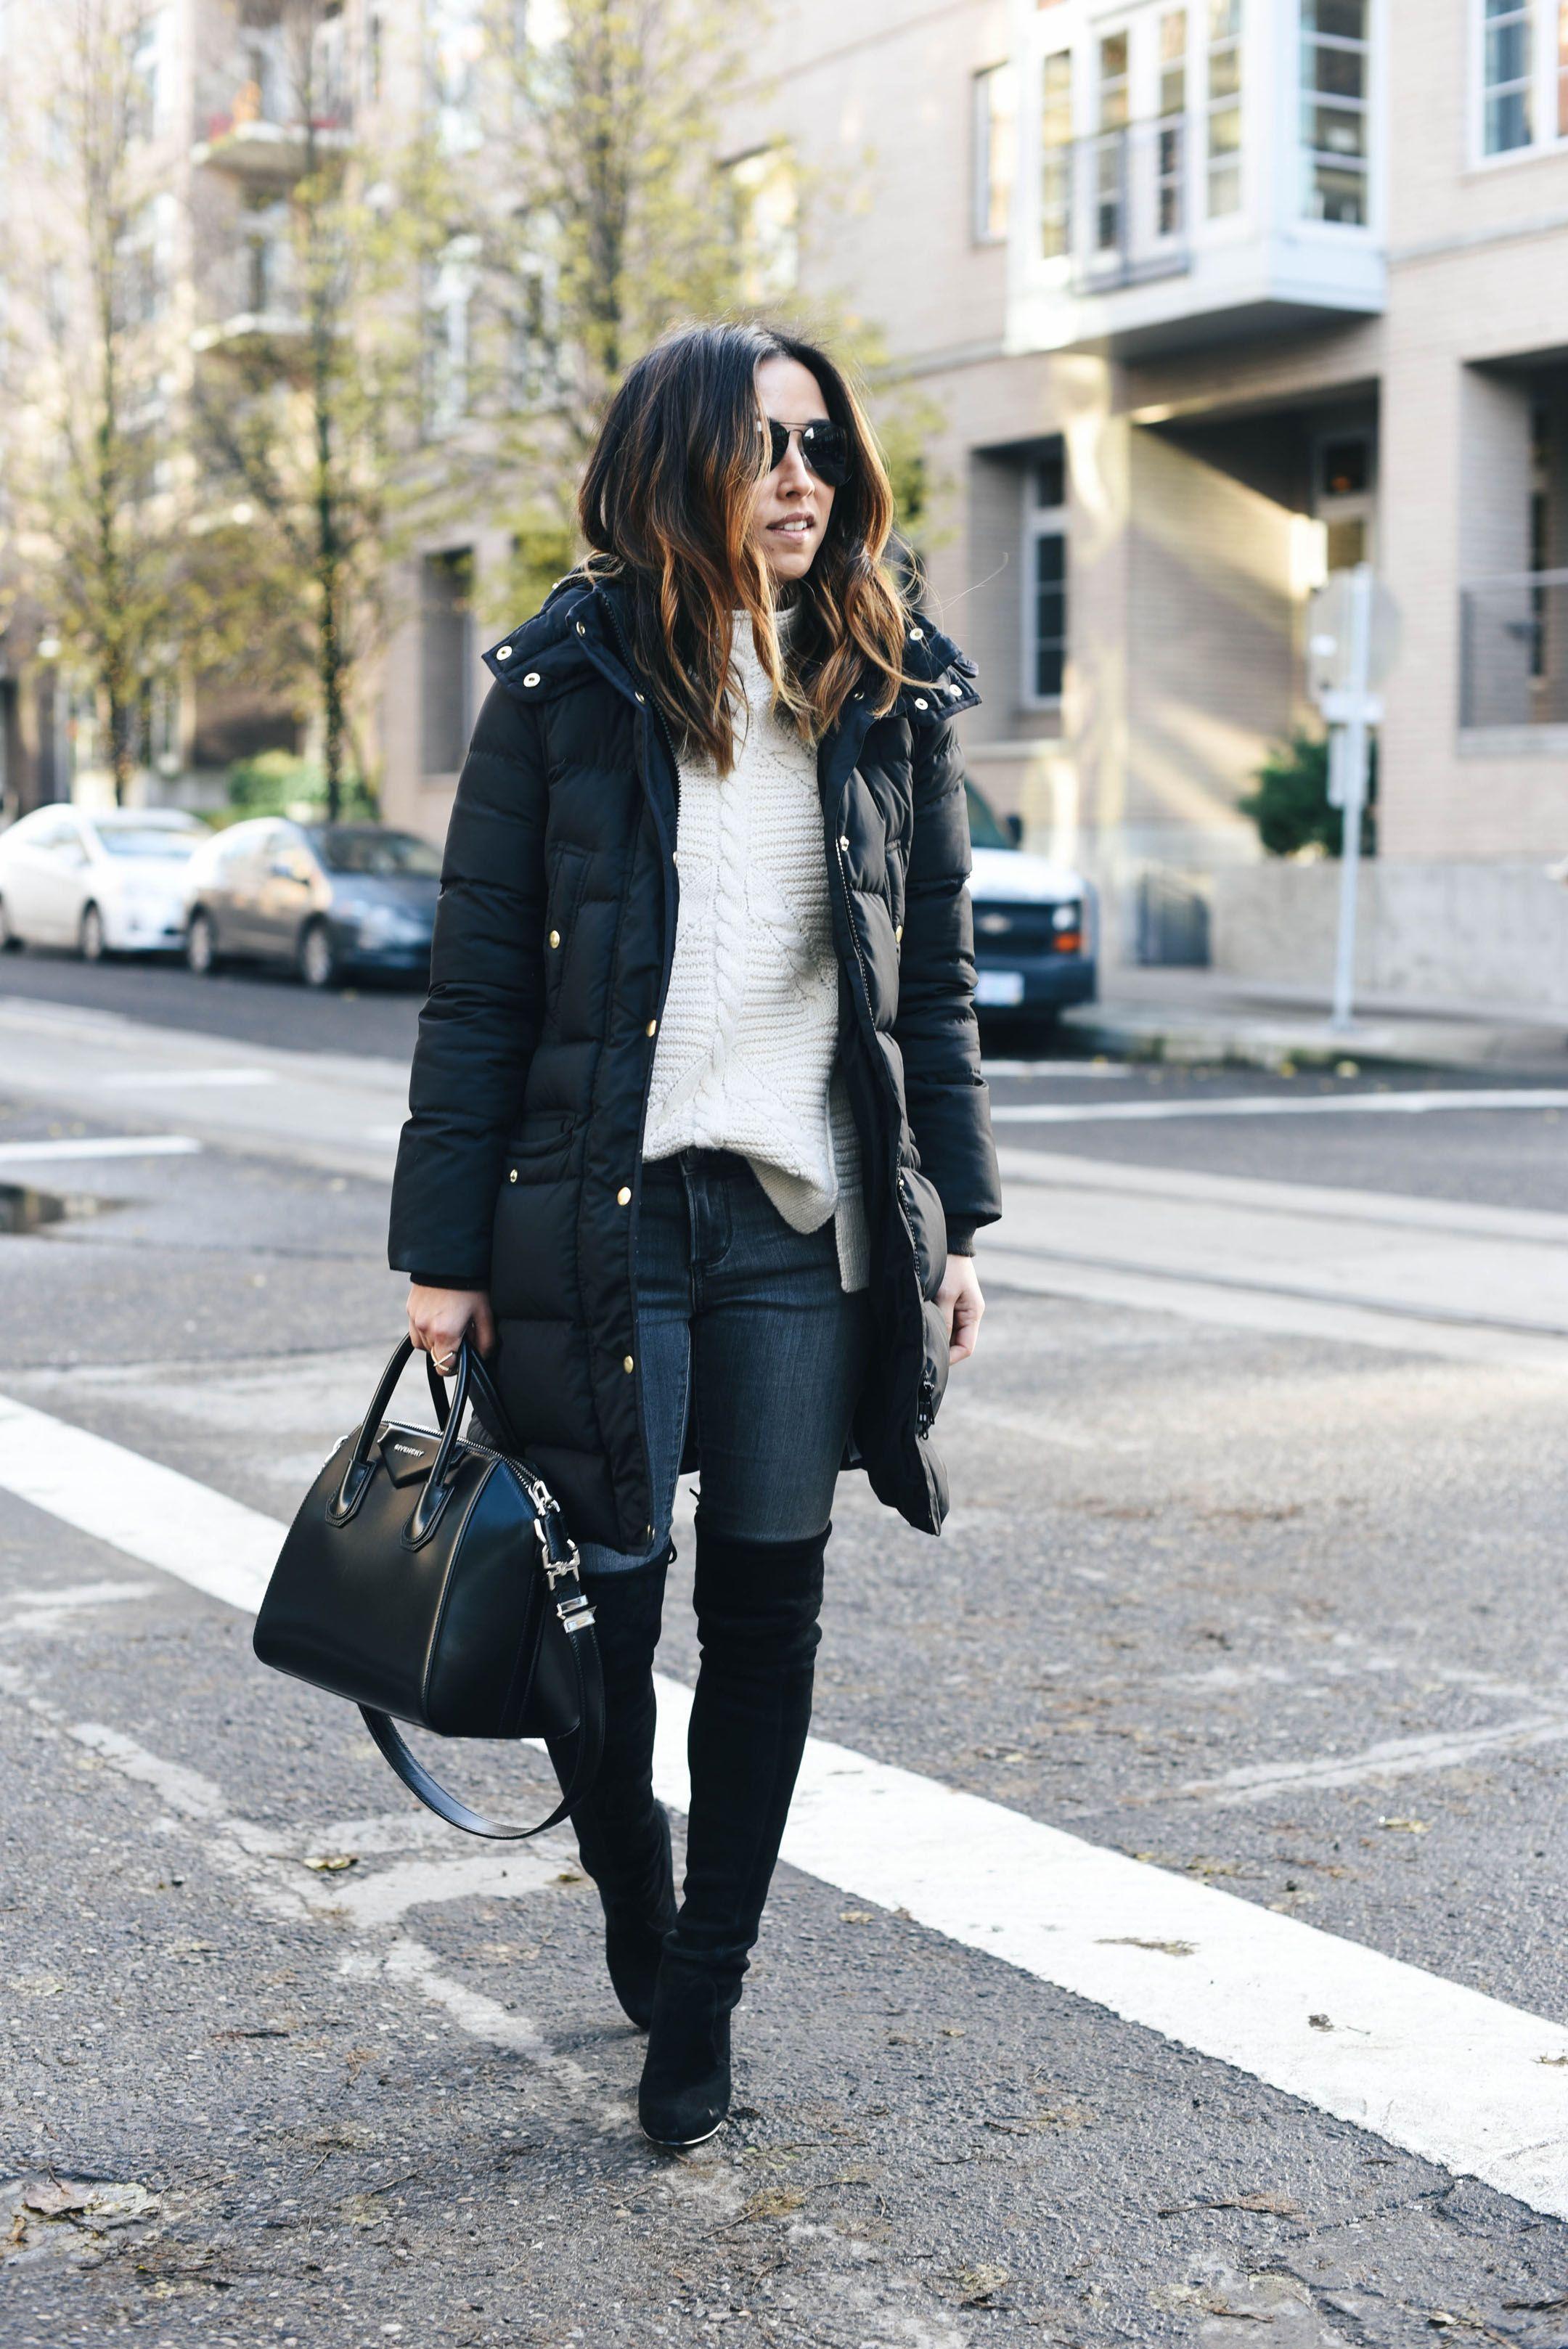 Best Puffer Coats For Winter Winter Fashion Outfits Puffer Coat Outfit Fashion Outfits [ 3236 x 2160 Pixel ]